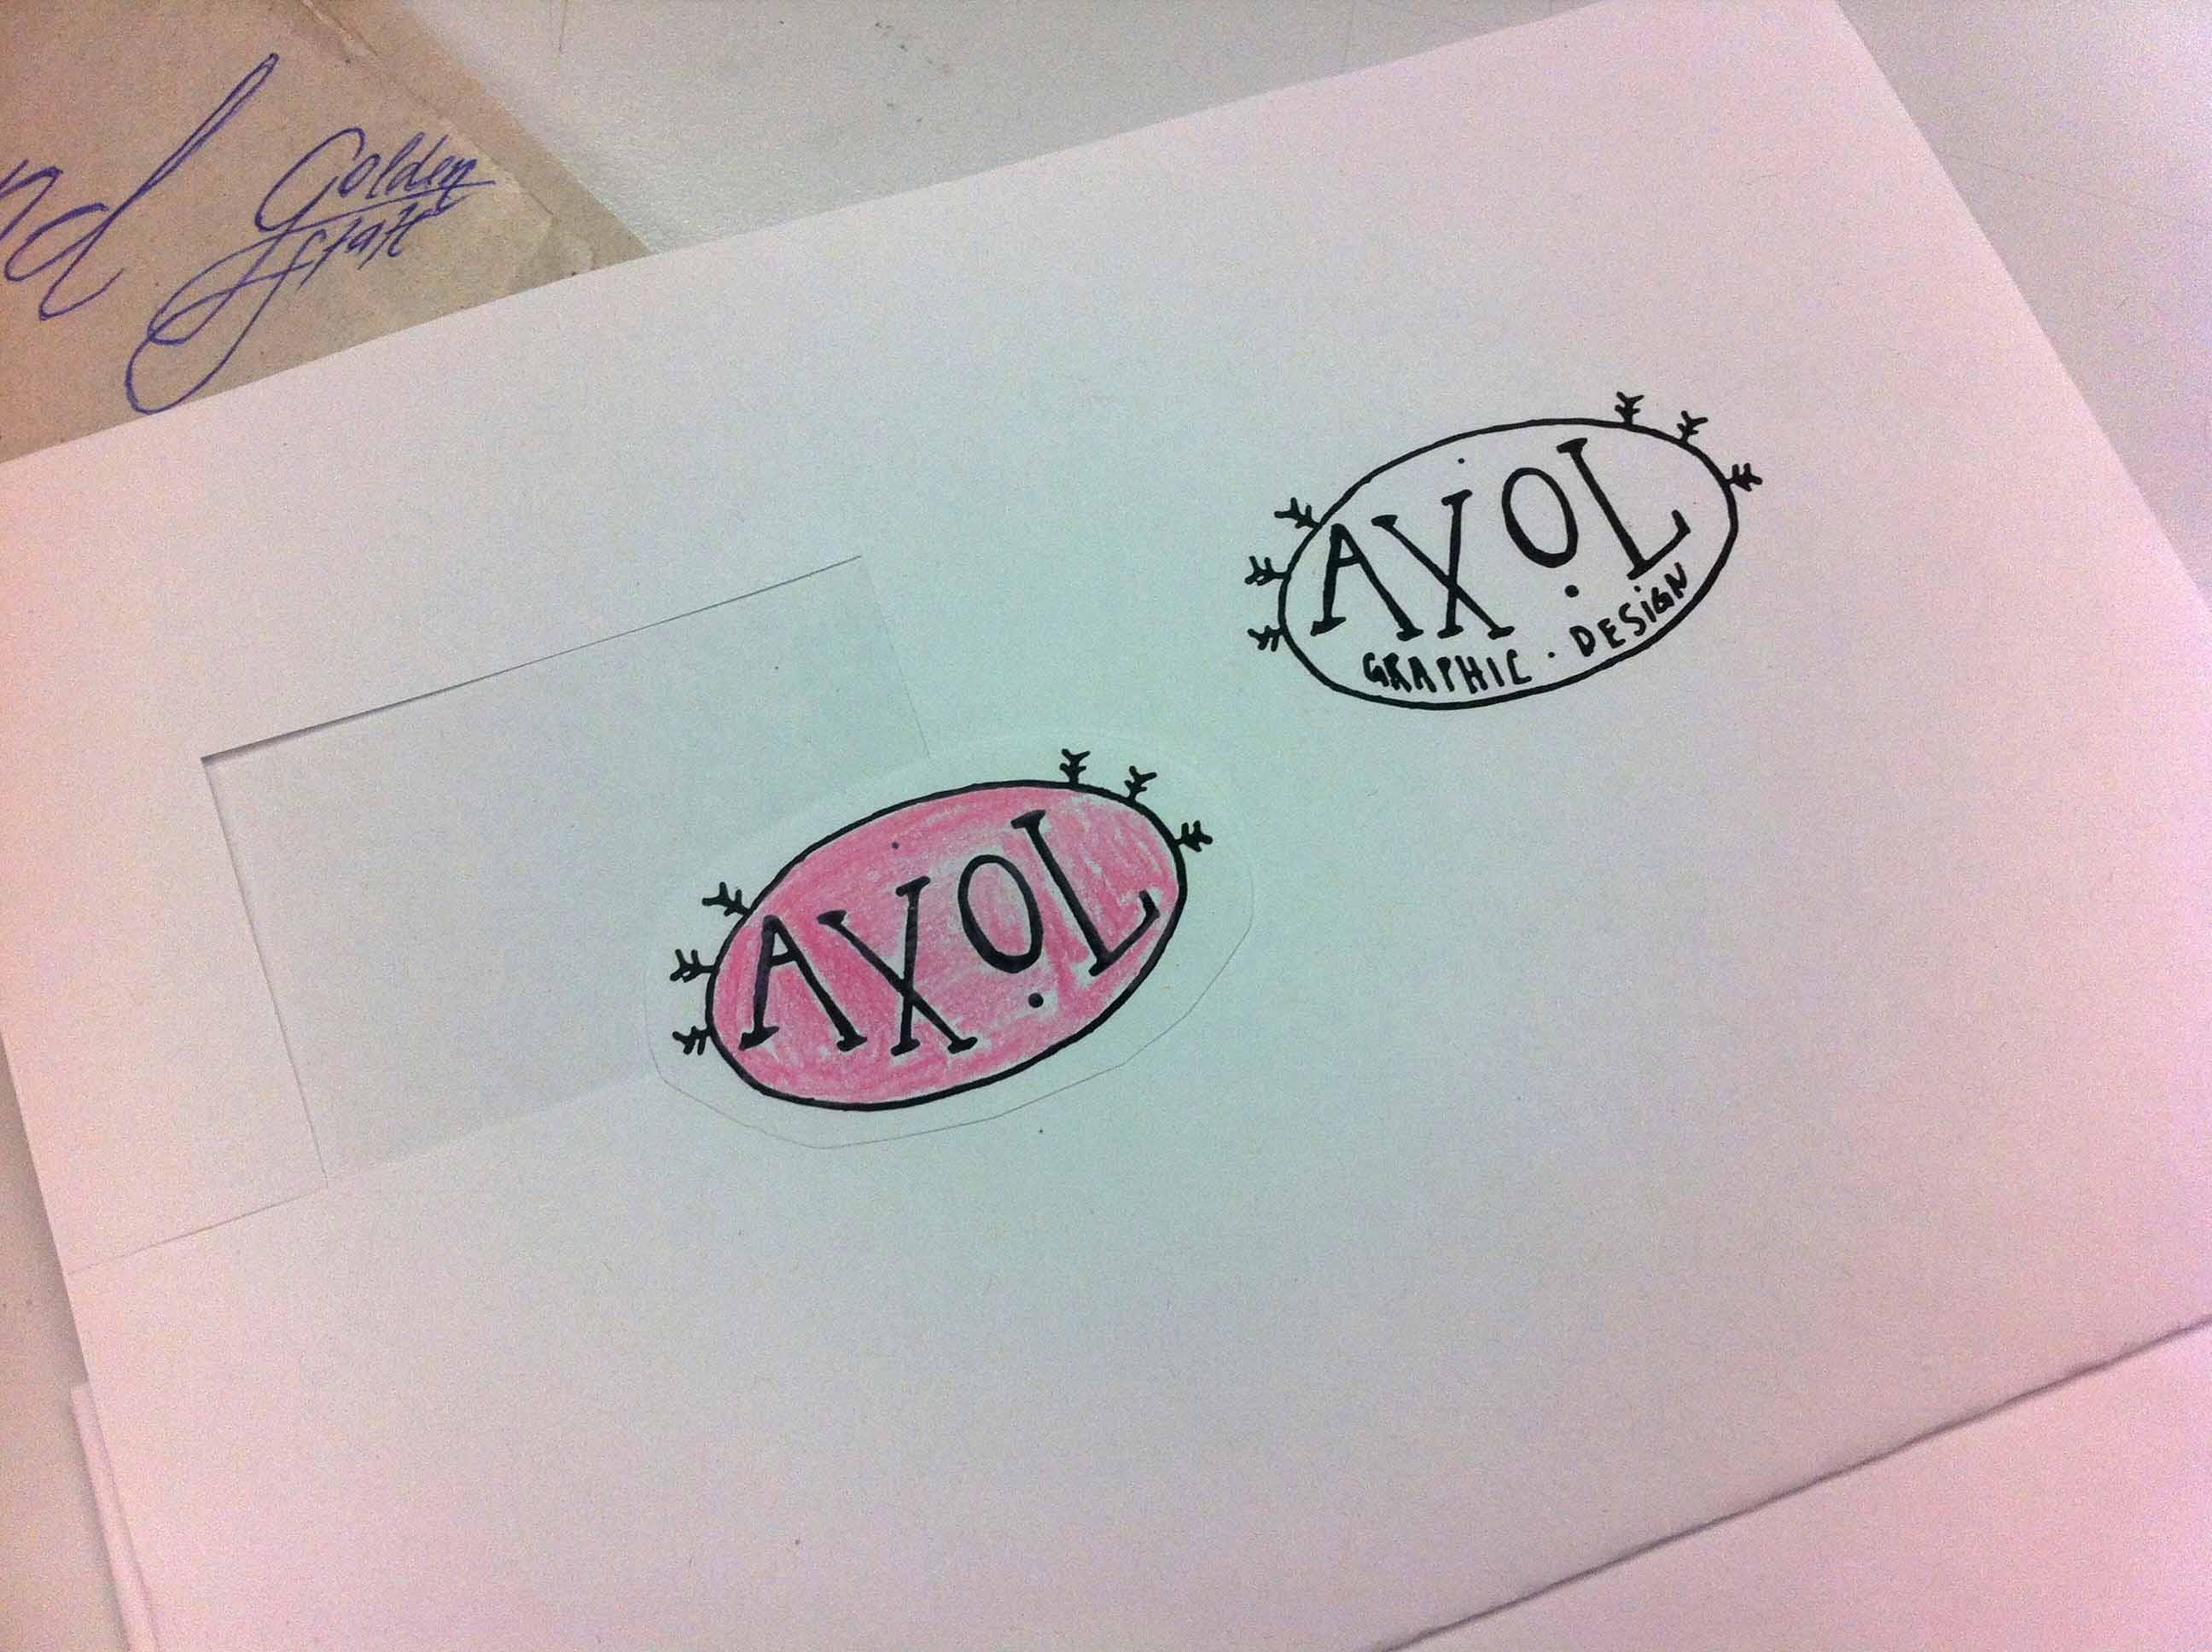 axol logo - image 17 - student project